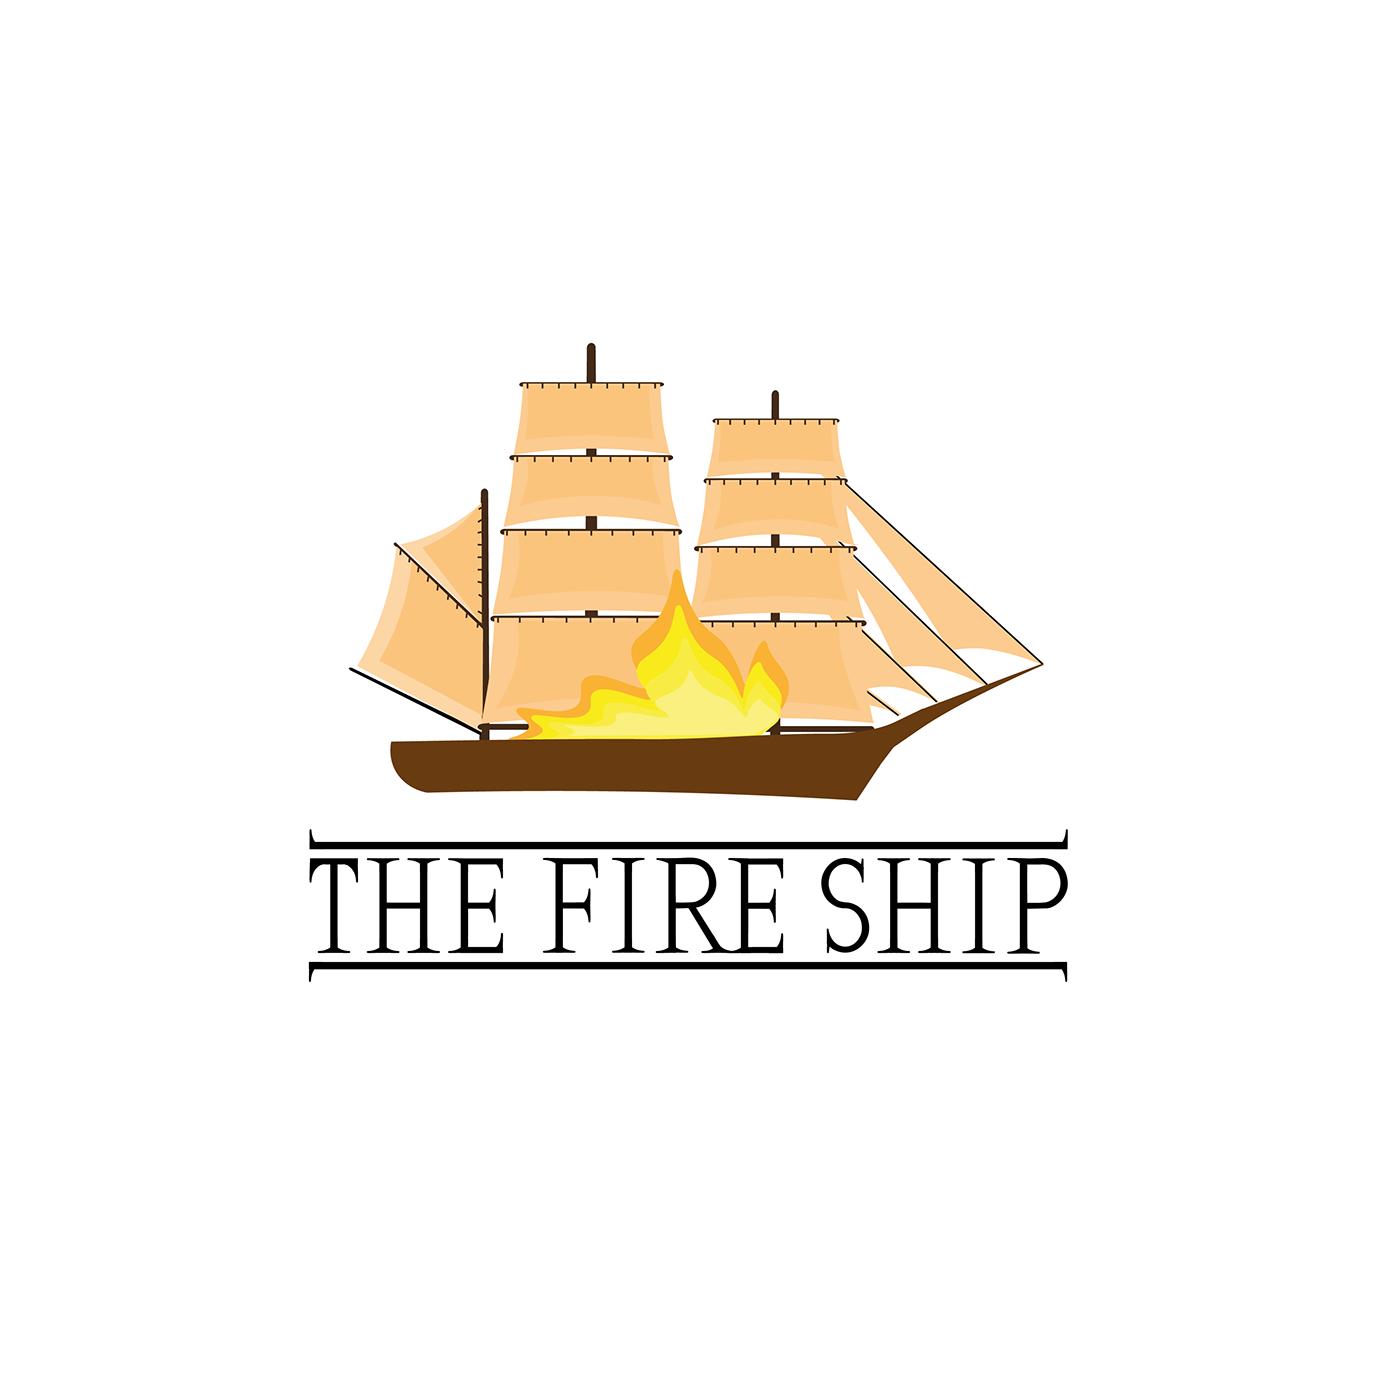 FIRE SHIP fire ship logo logo Logo Art logo designer logo ship Logo showcase logo uk logos Ship Logo